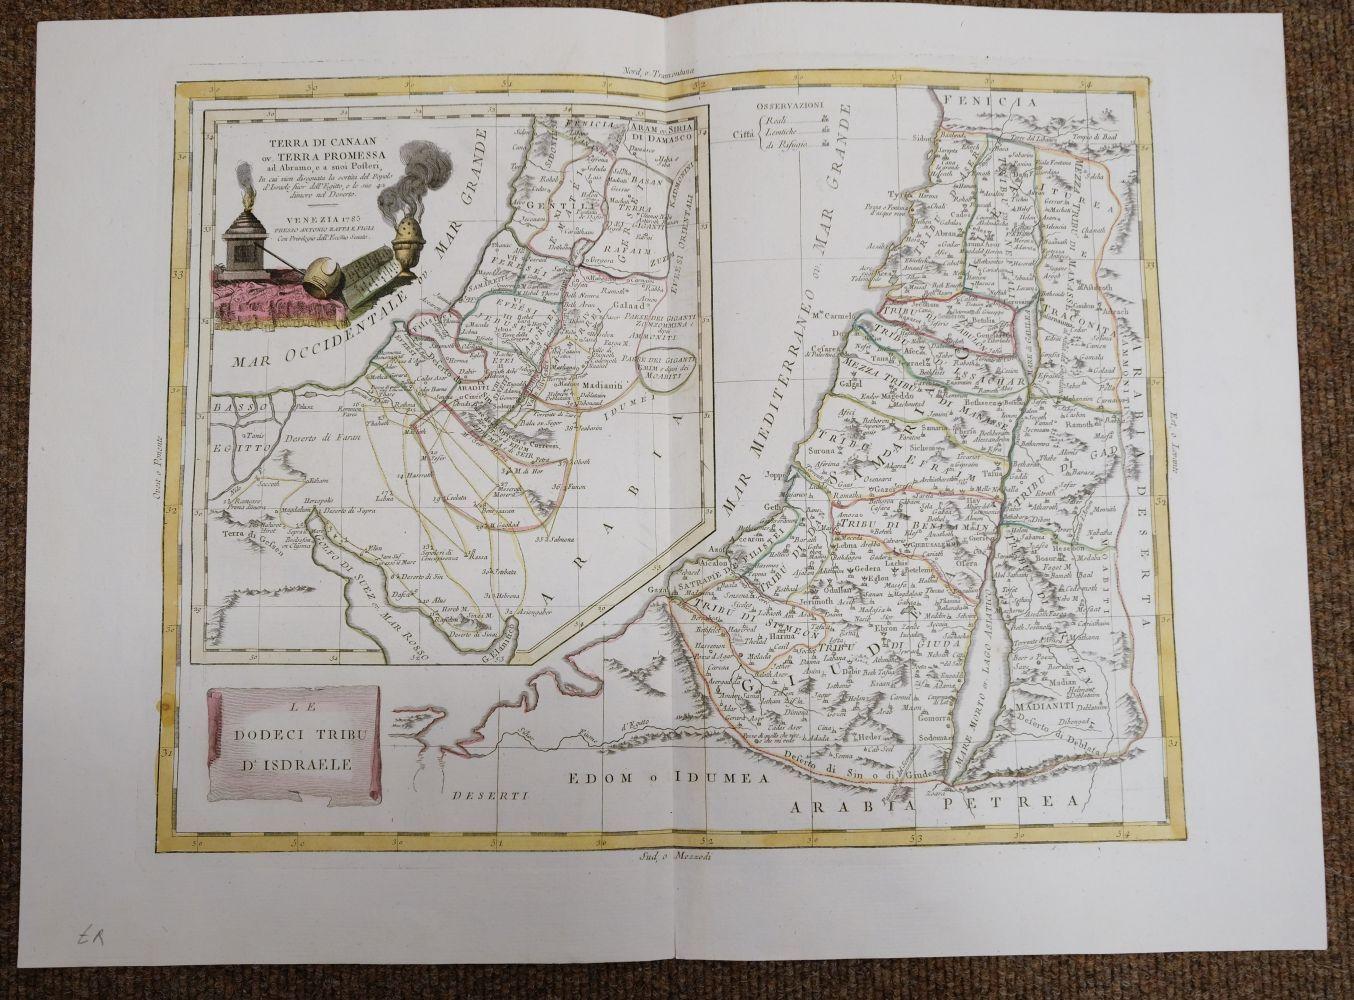 Holy Land. Ottens (R. & J.), Het Beloofde Landt Israels. Terra Sancta..., Amsterdam, circa 1765 - Image 7 of 10